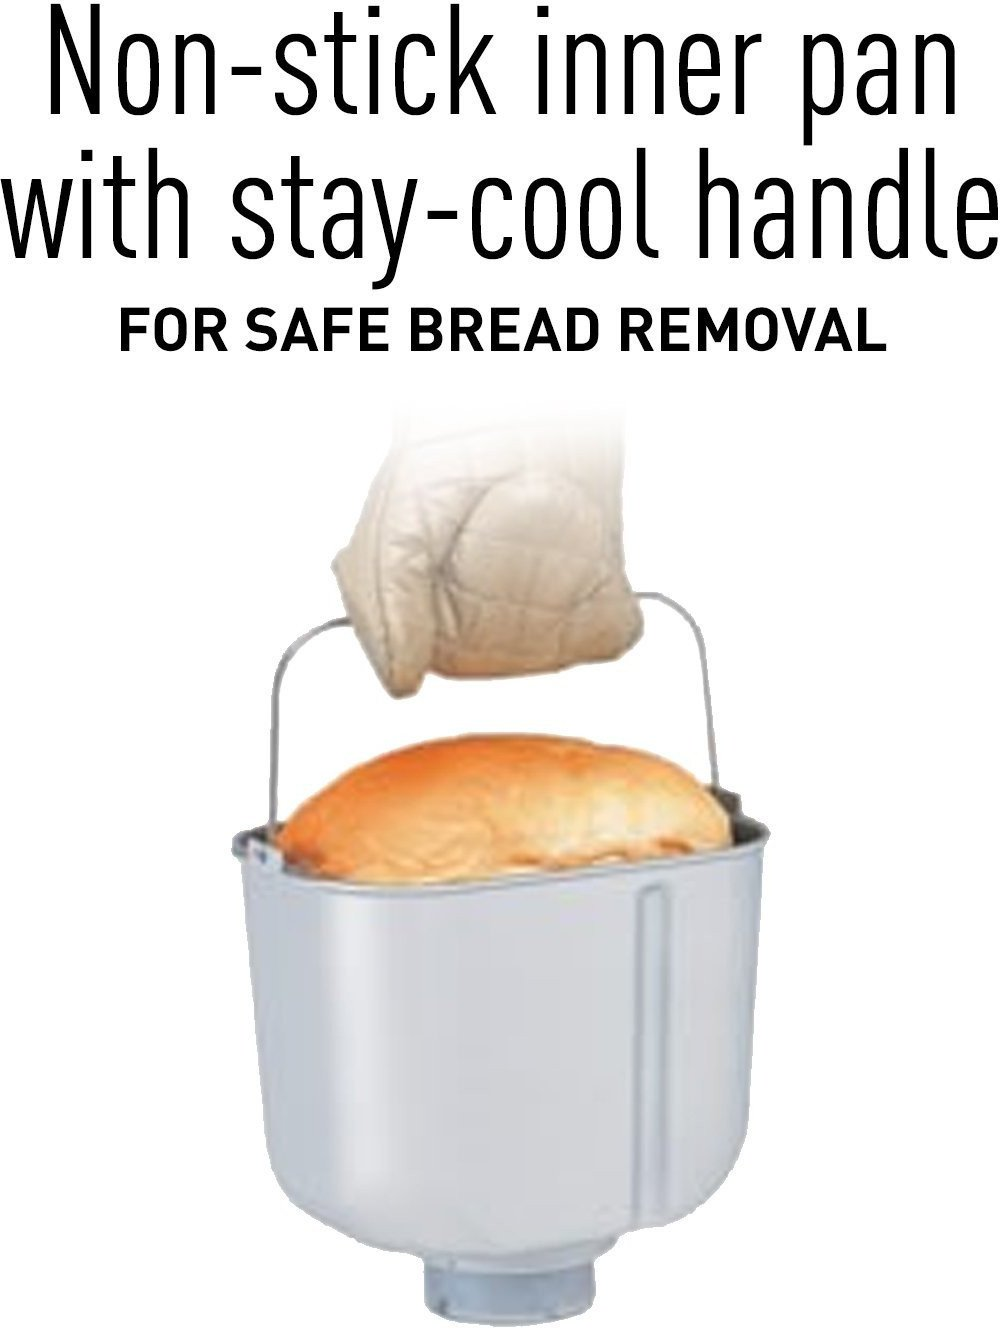 Panasonic SD-YR2500 Bread Maker with Gluten Free Mode and Yeast / Raisin / Nut Dispenser, Black by Panasonic (Image #7)